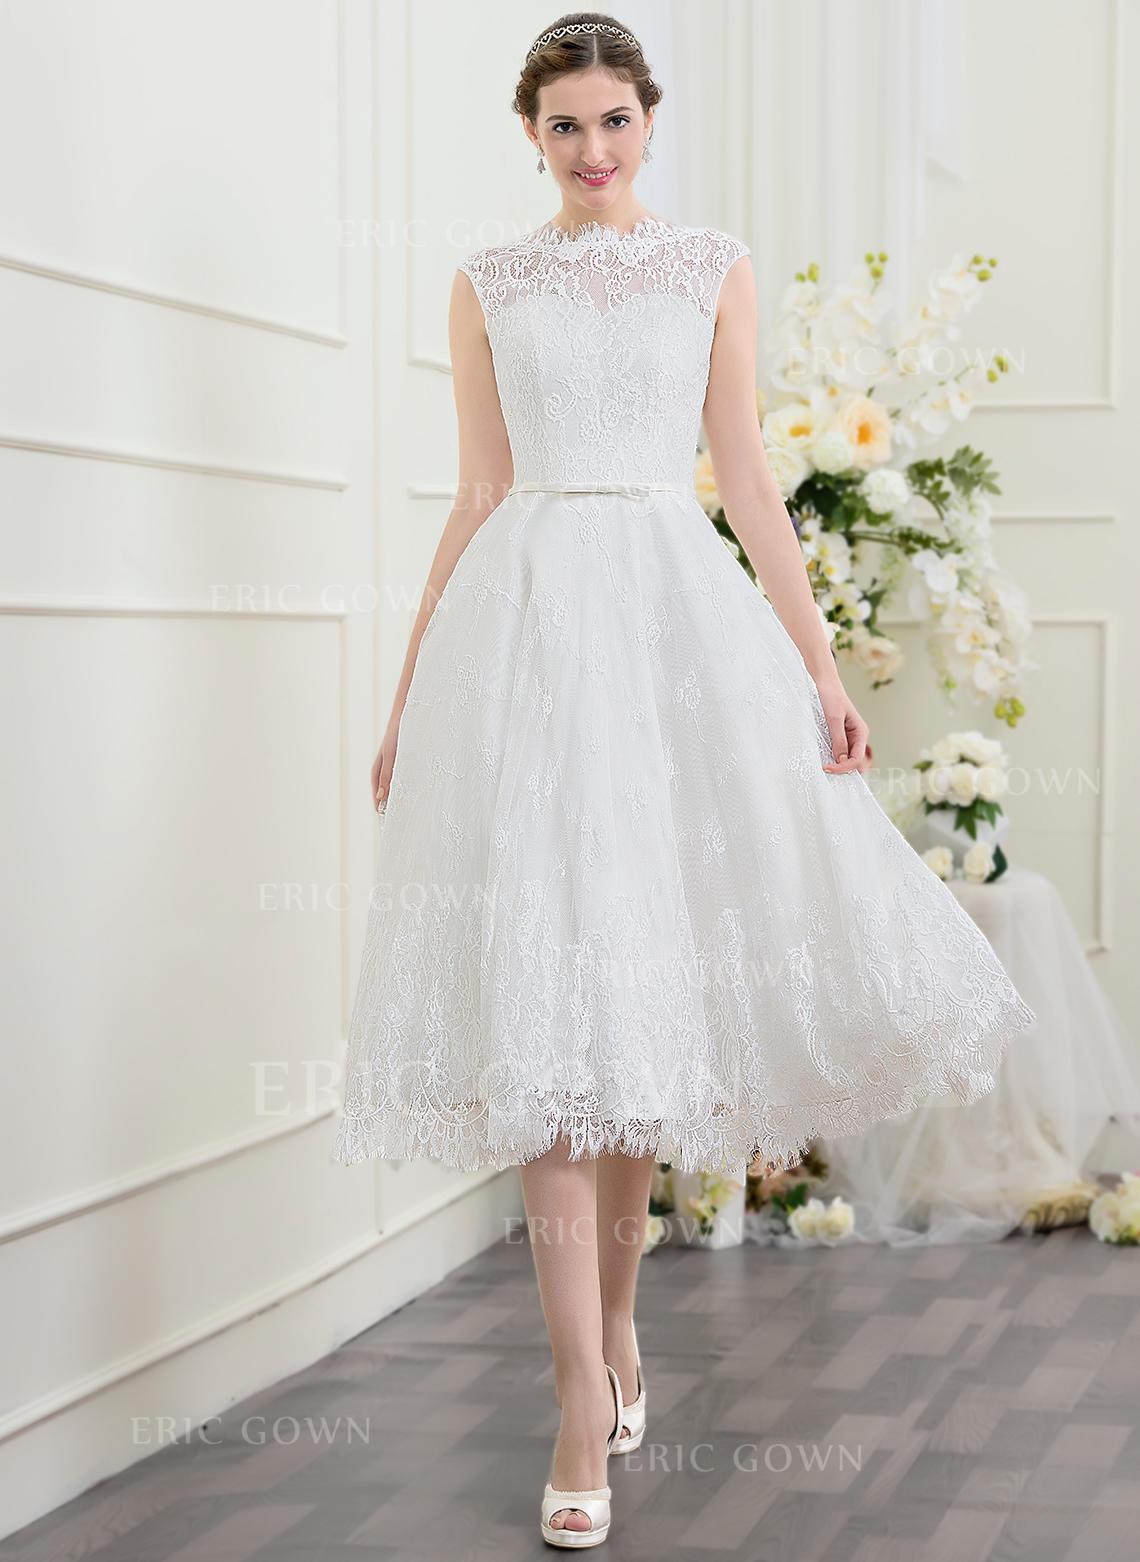 568d1b6bfdf Scoop A-Line Princess Wedding Dresses Lace Bow(s) Sleeveless Tea-. Loading  zoom